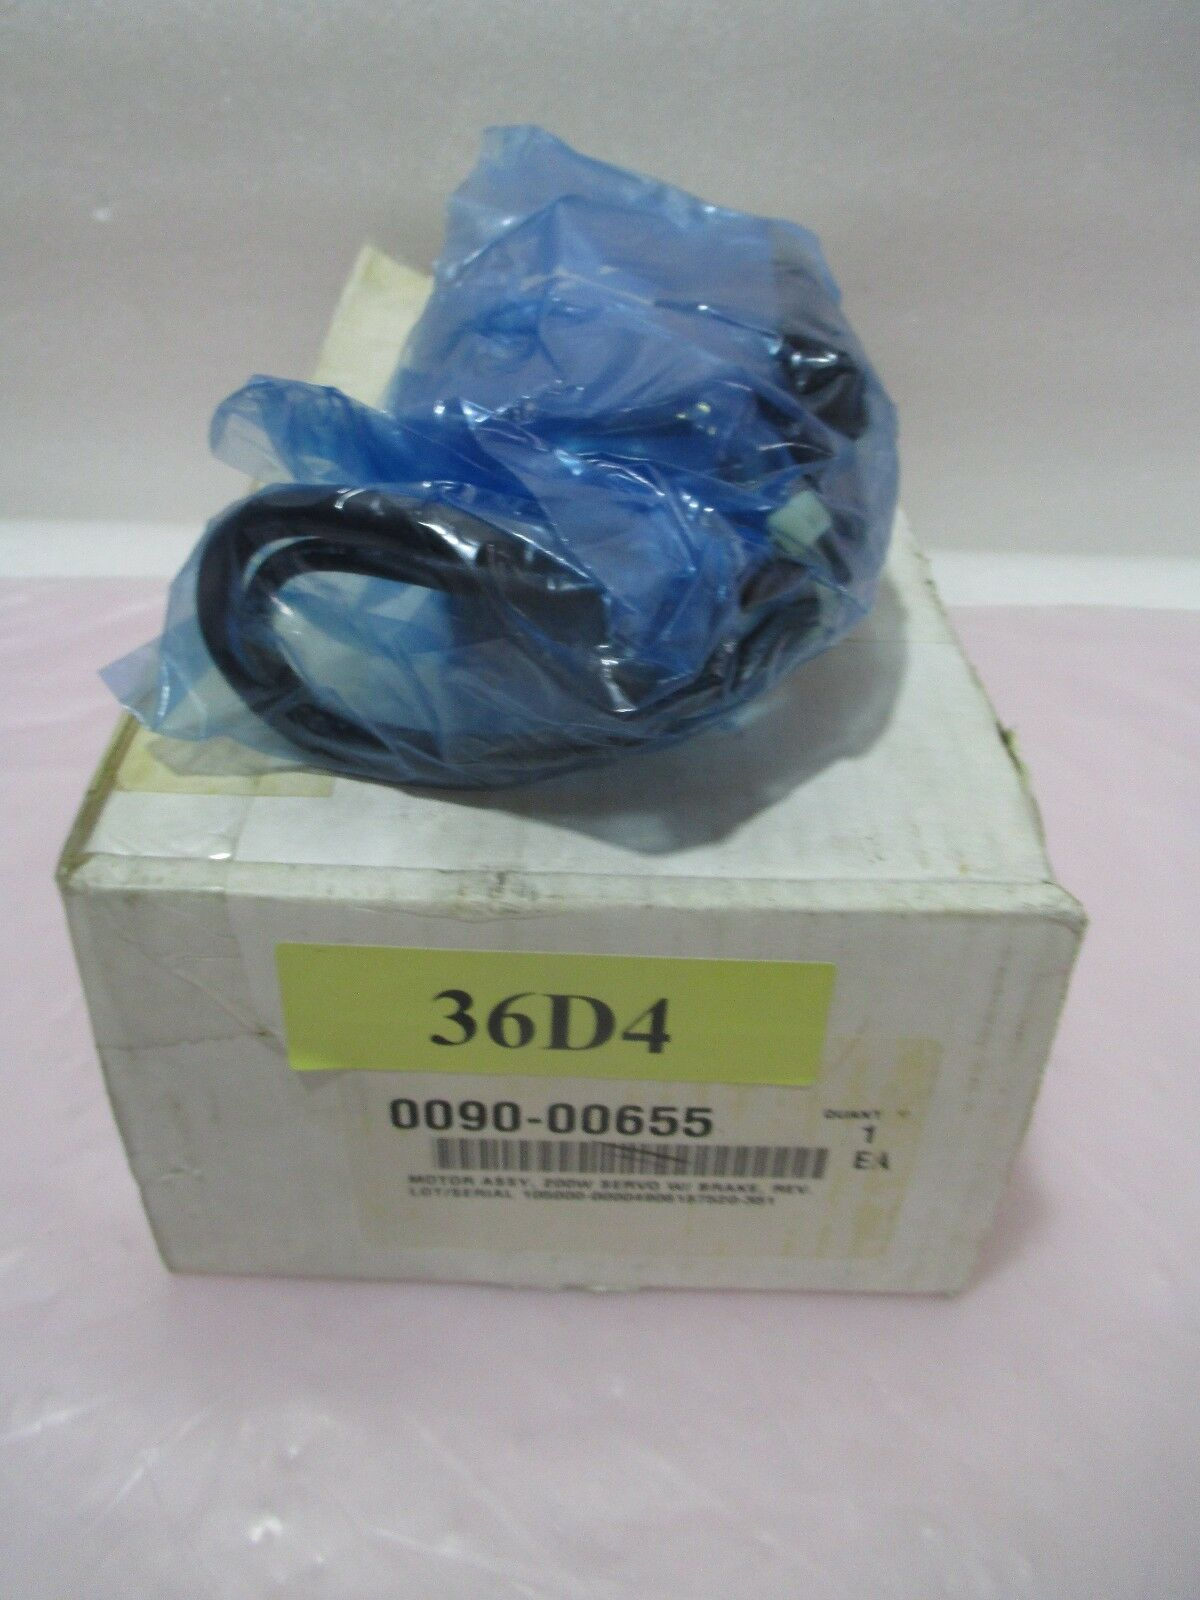 AMAT 0090-00655 Motor Assembly, 200w, Servo W/ Brake, Sanyo Denki, 421899